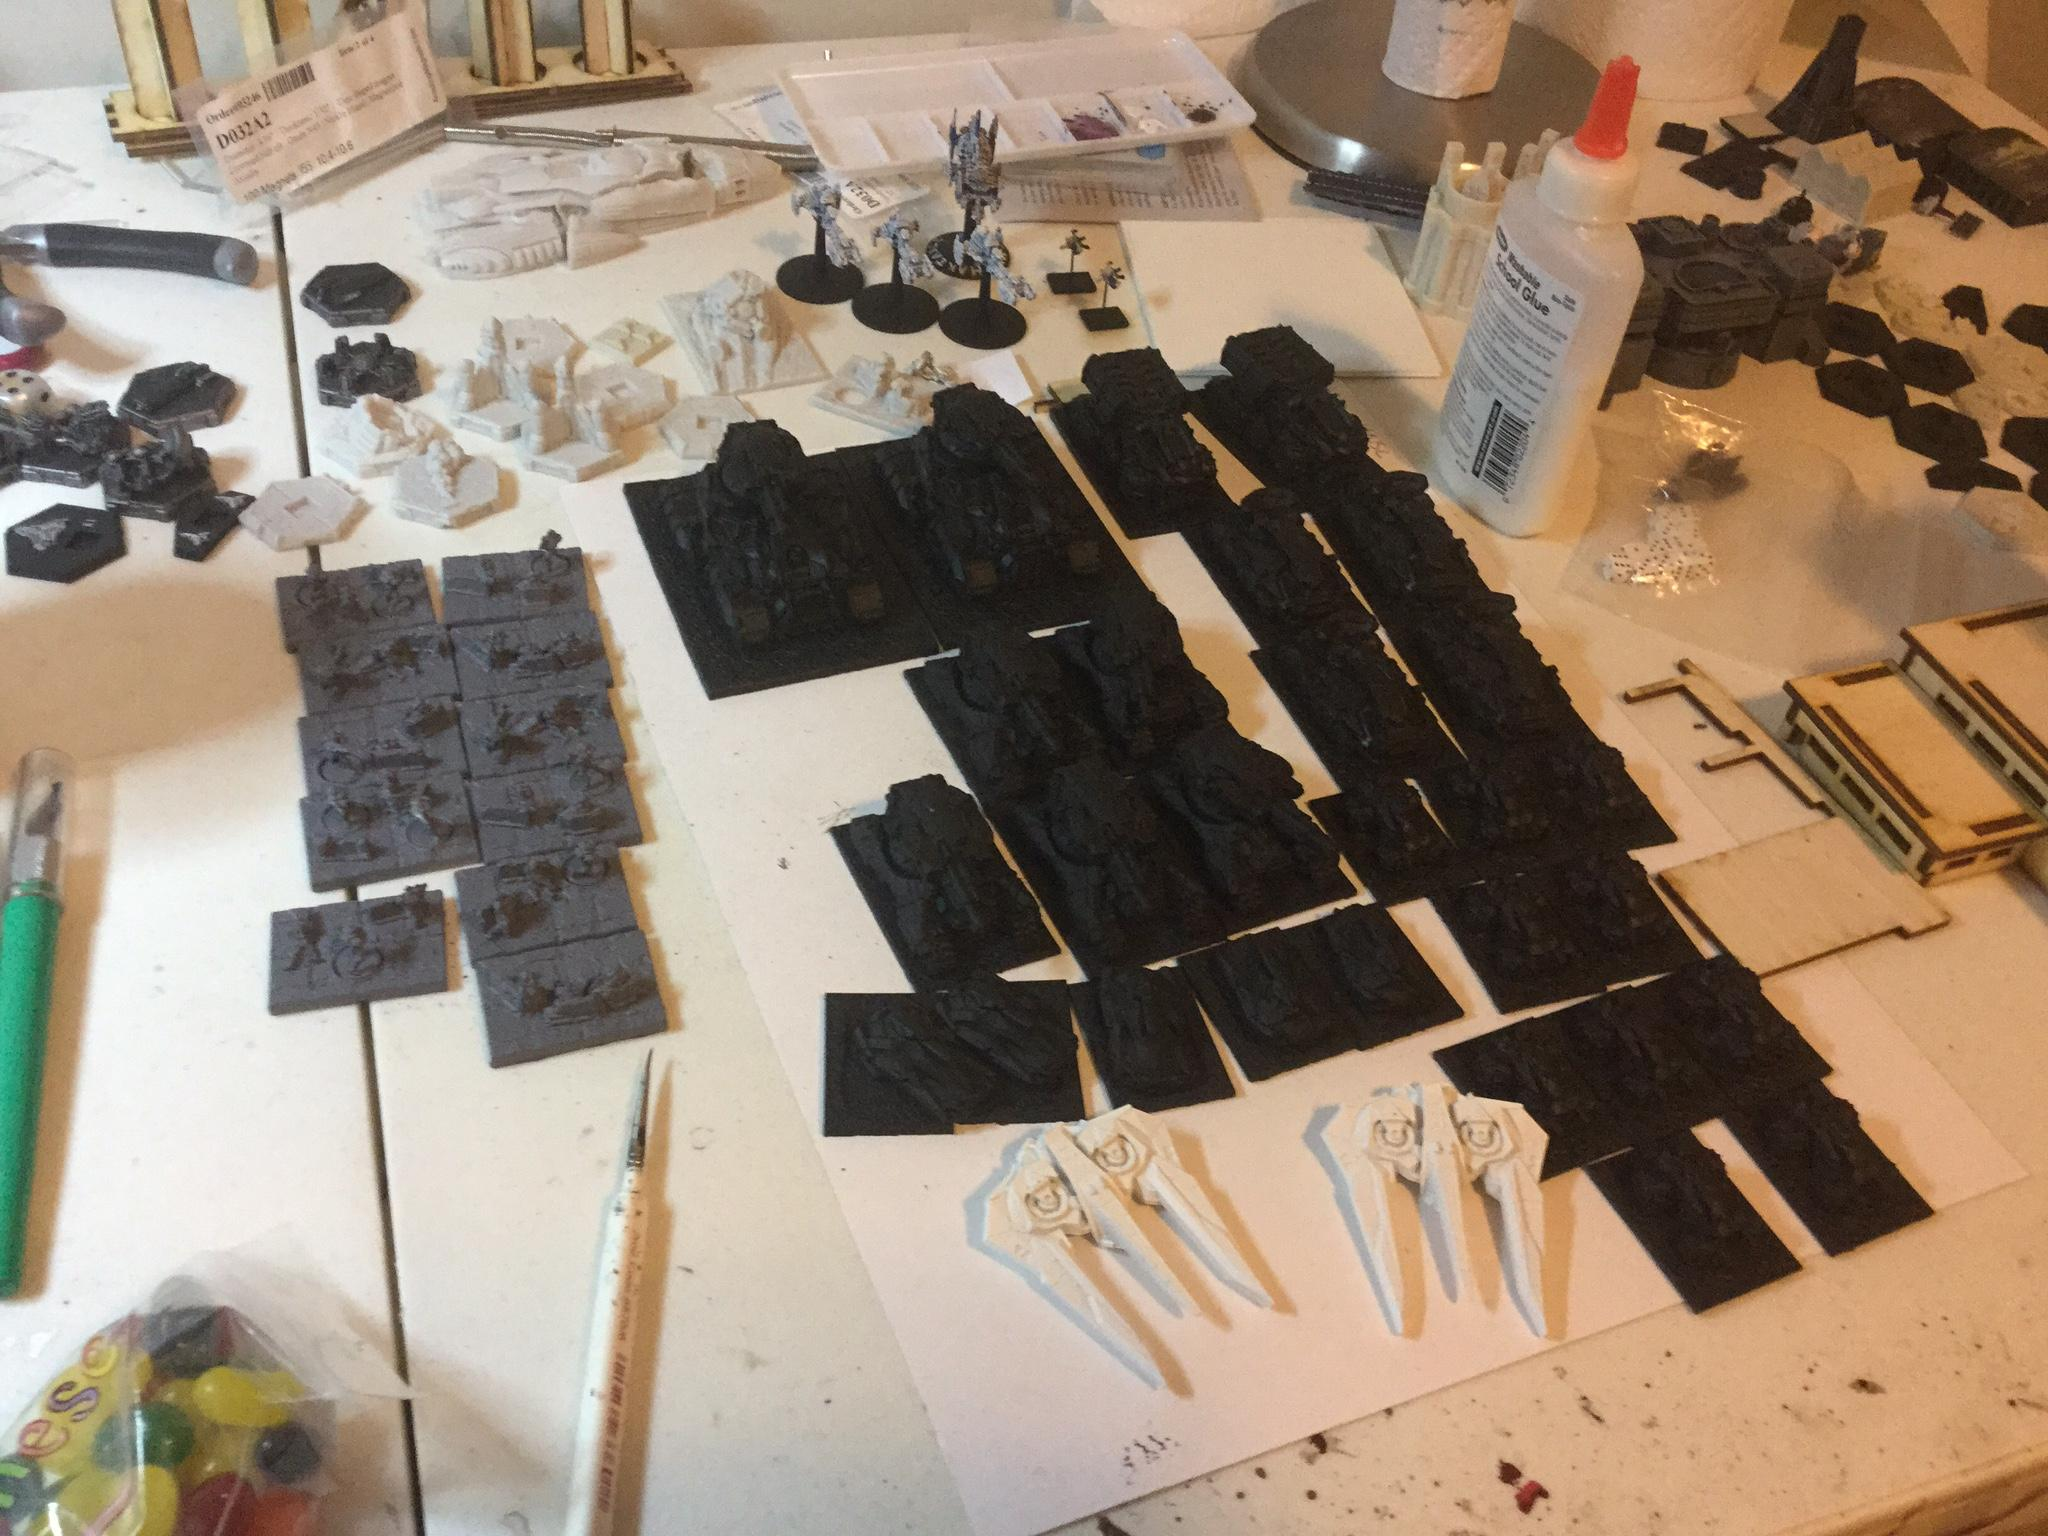 10mm, Firestorm, Planetfall, Sci Fi, Spartan Games